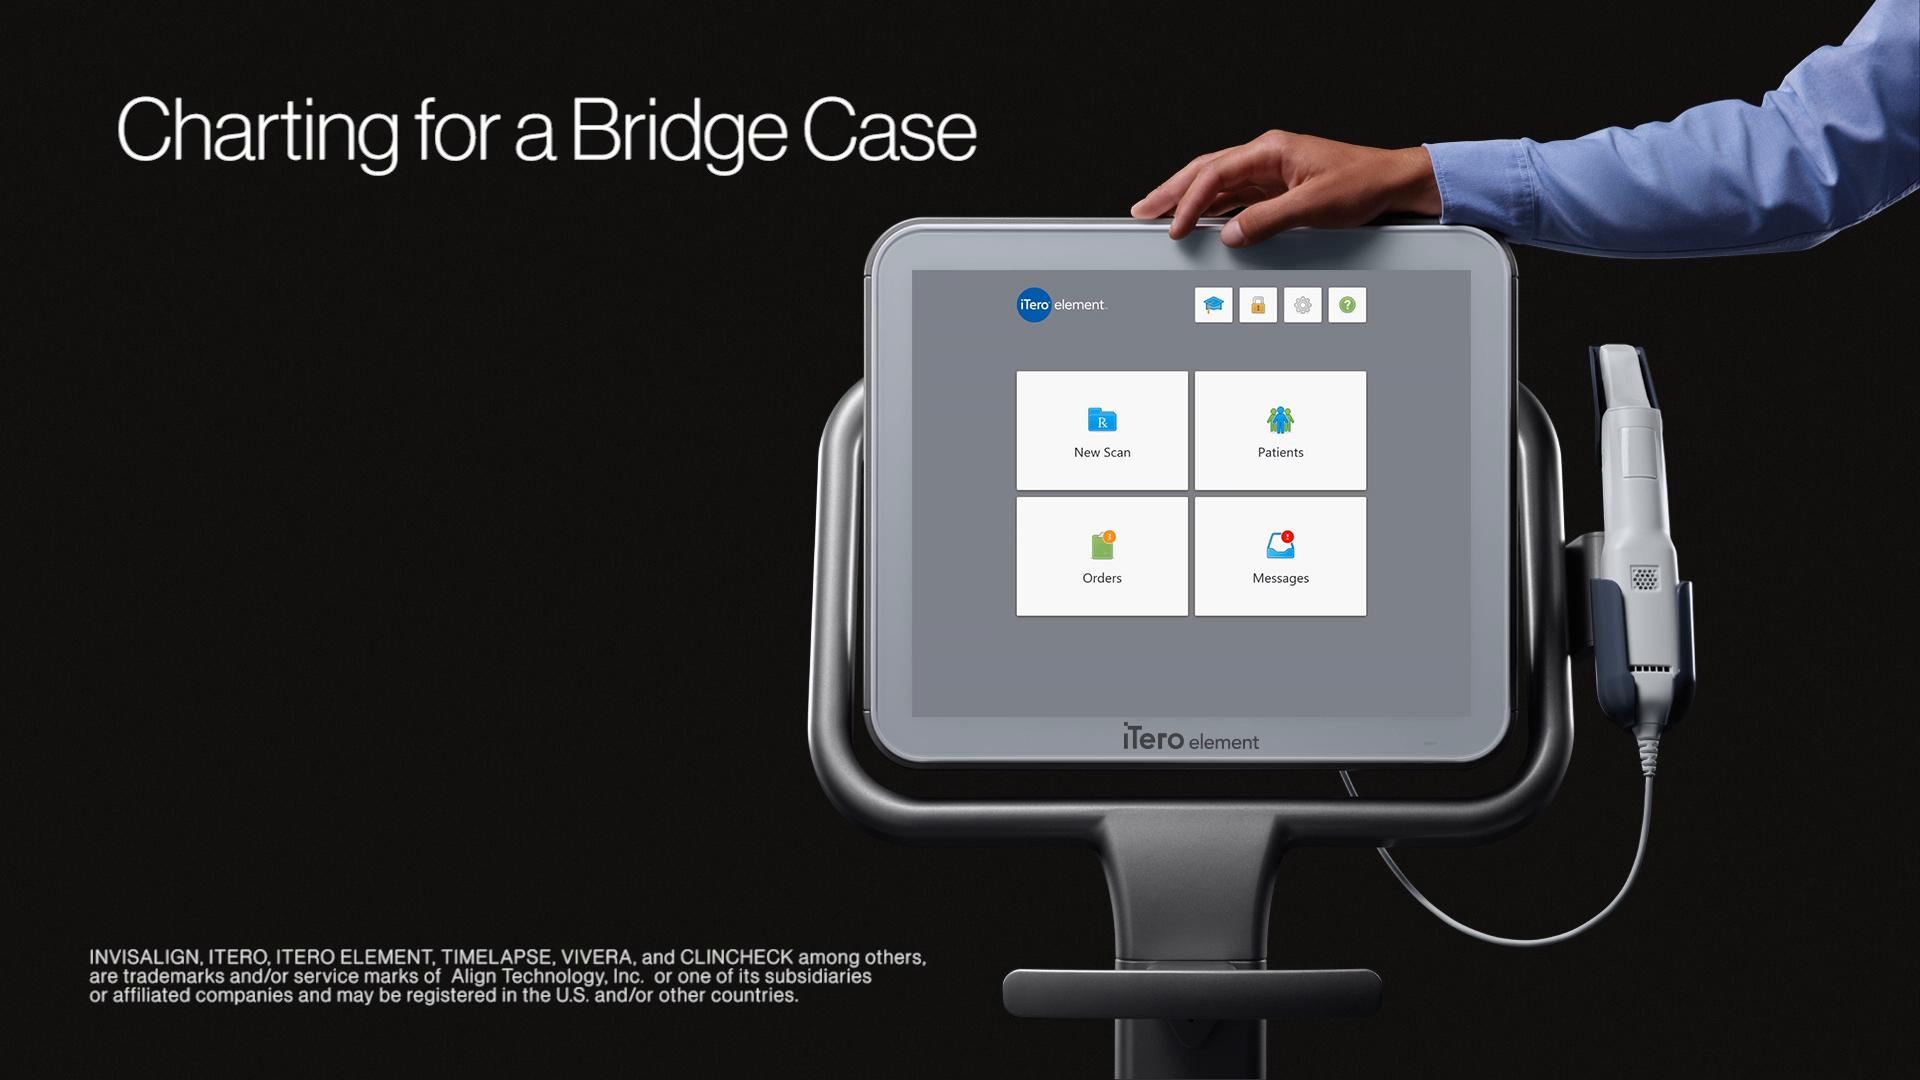 1:45 minutes:   Charting a Bridge Case